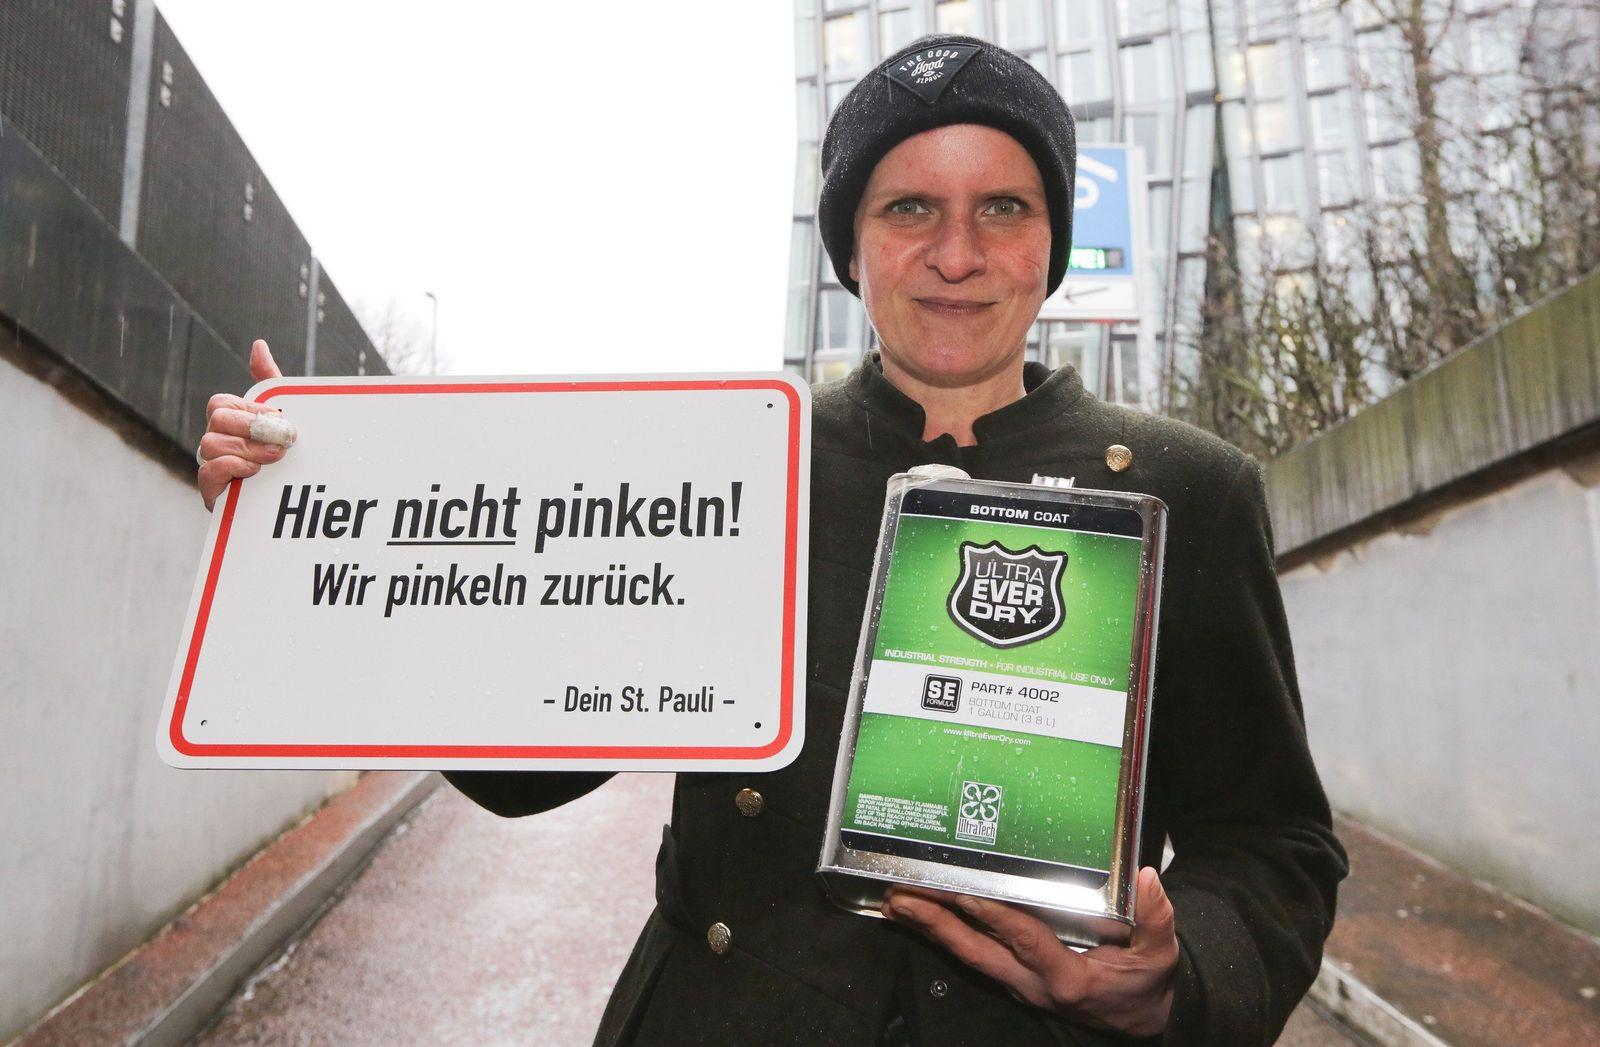 Julia Staron / St. Pauli pinkelt zurück